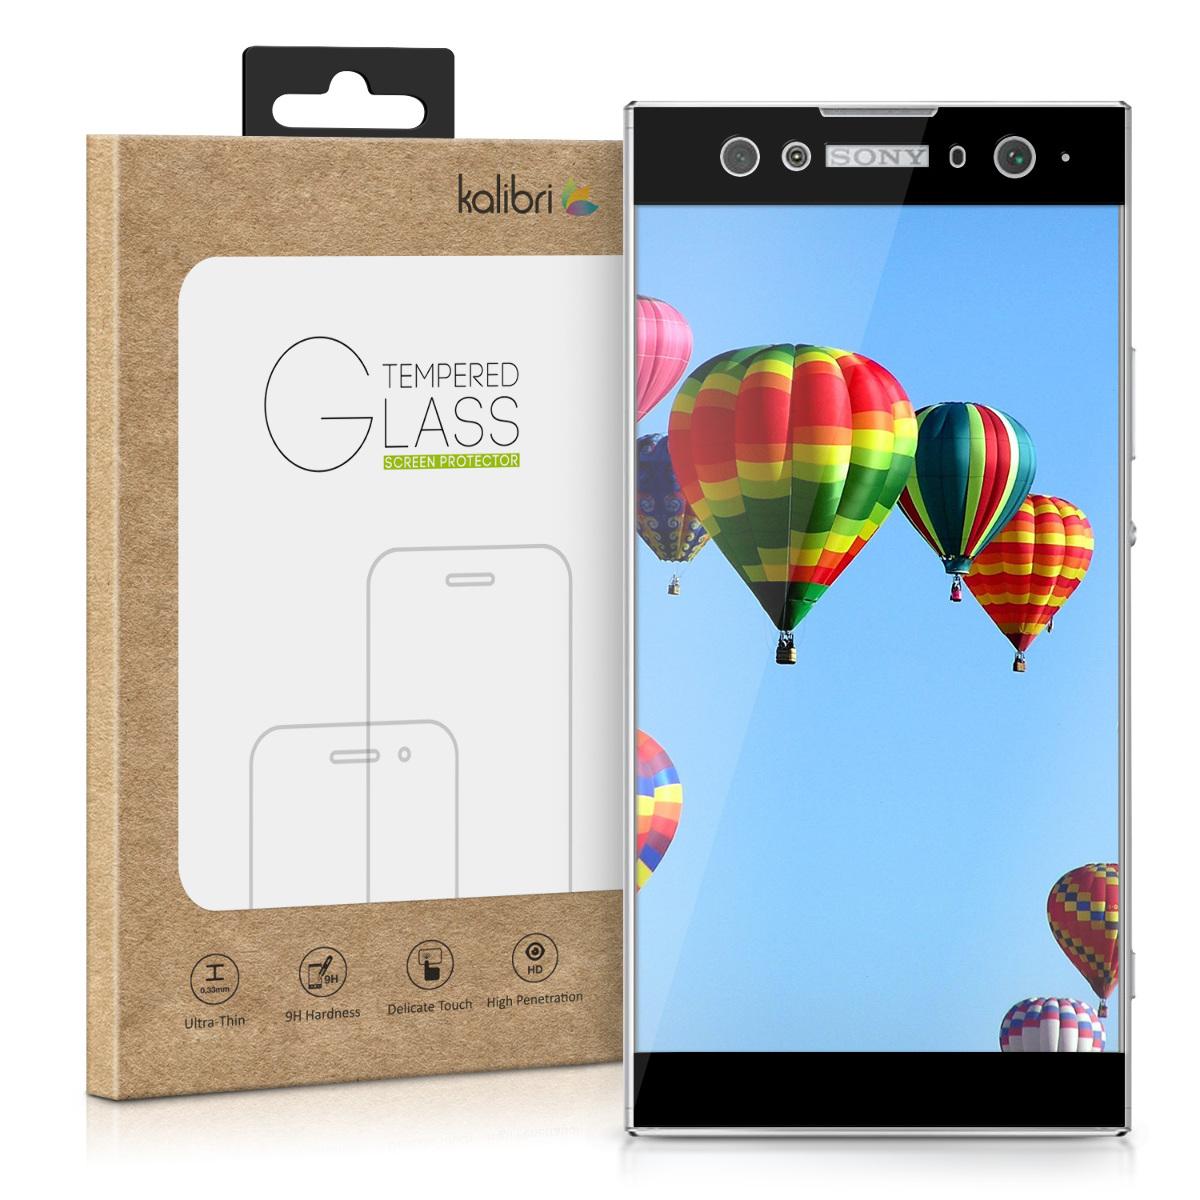 Kalibri Tempered Glass - Fullface Αντιχαρακτικό Γυαλί Οθόνης Sony Xperia XA2 Ultra (44595.01)